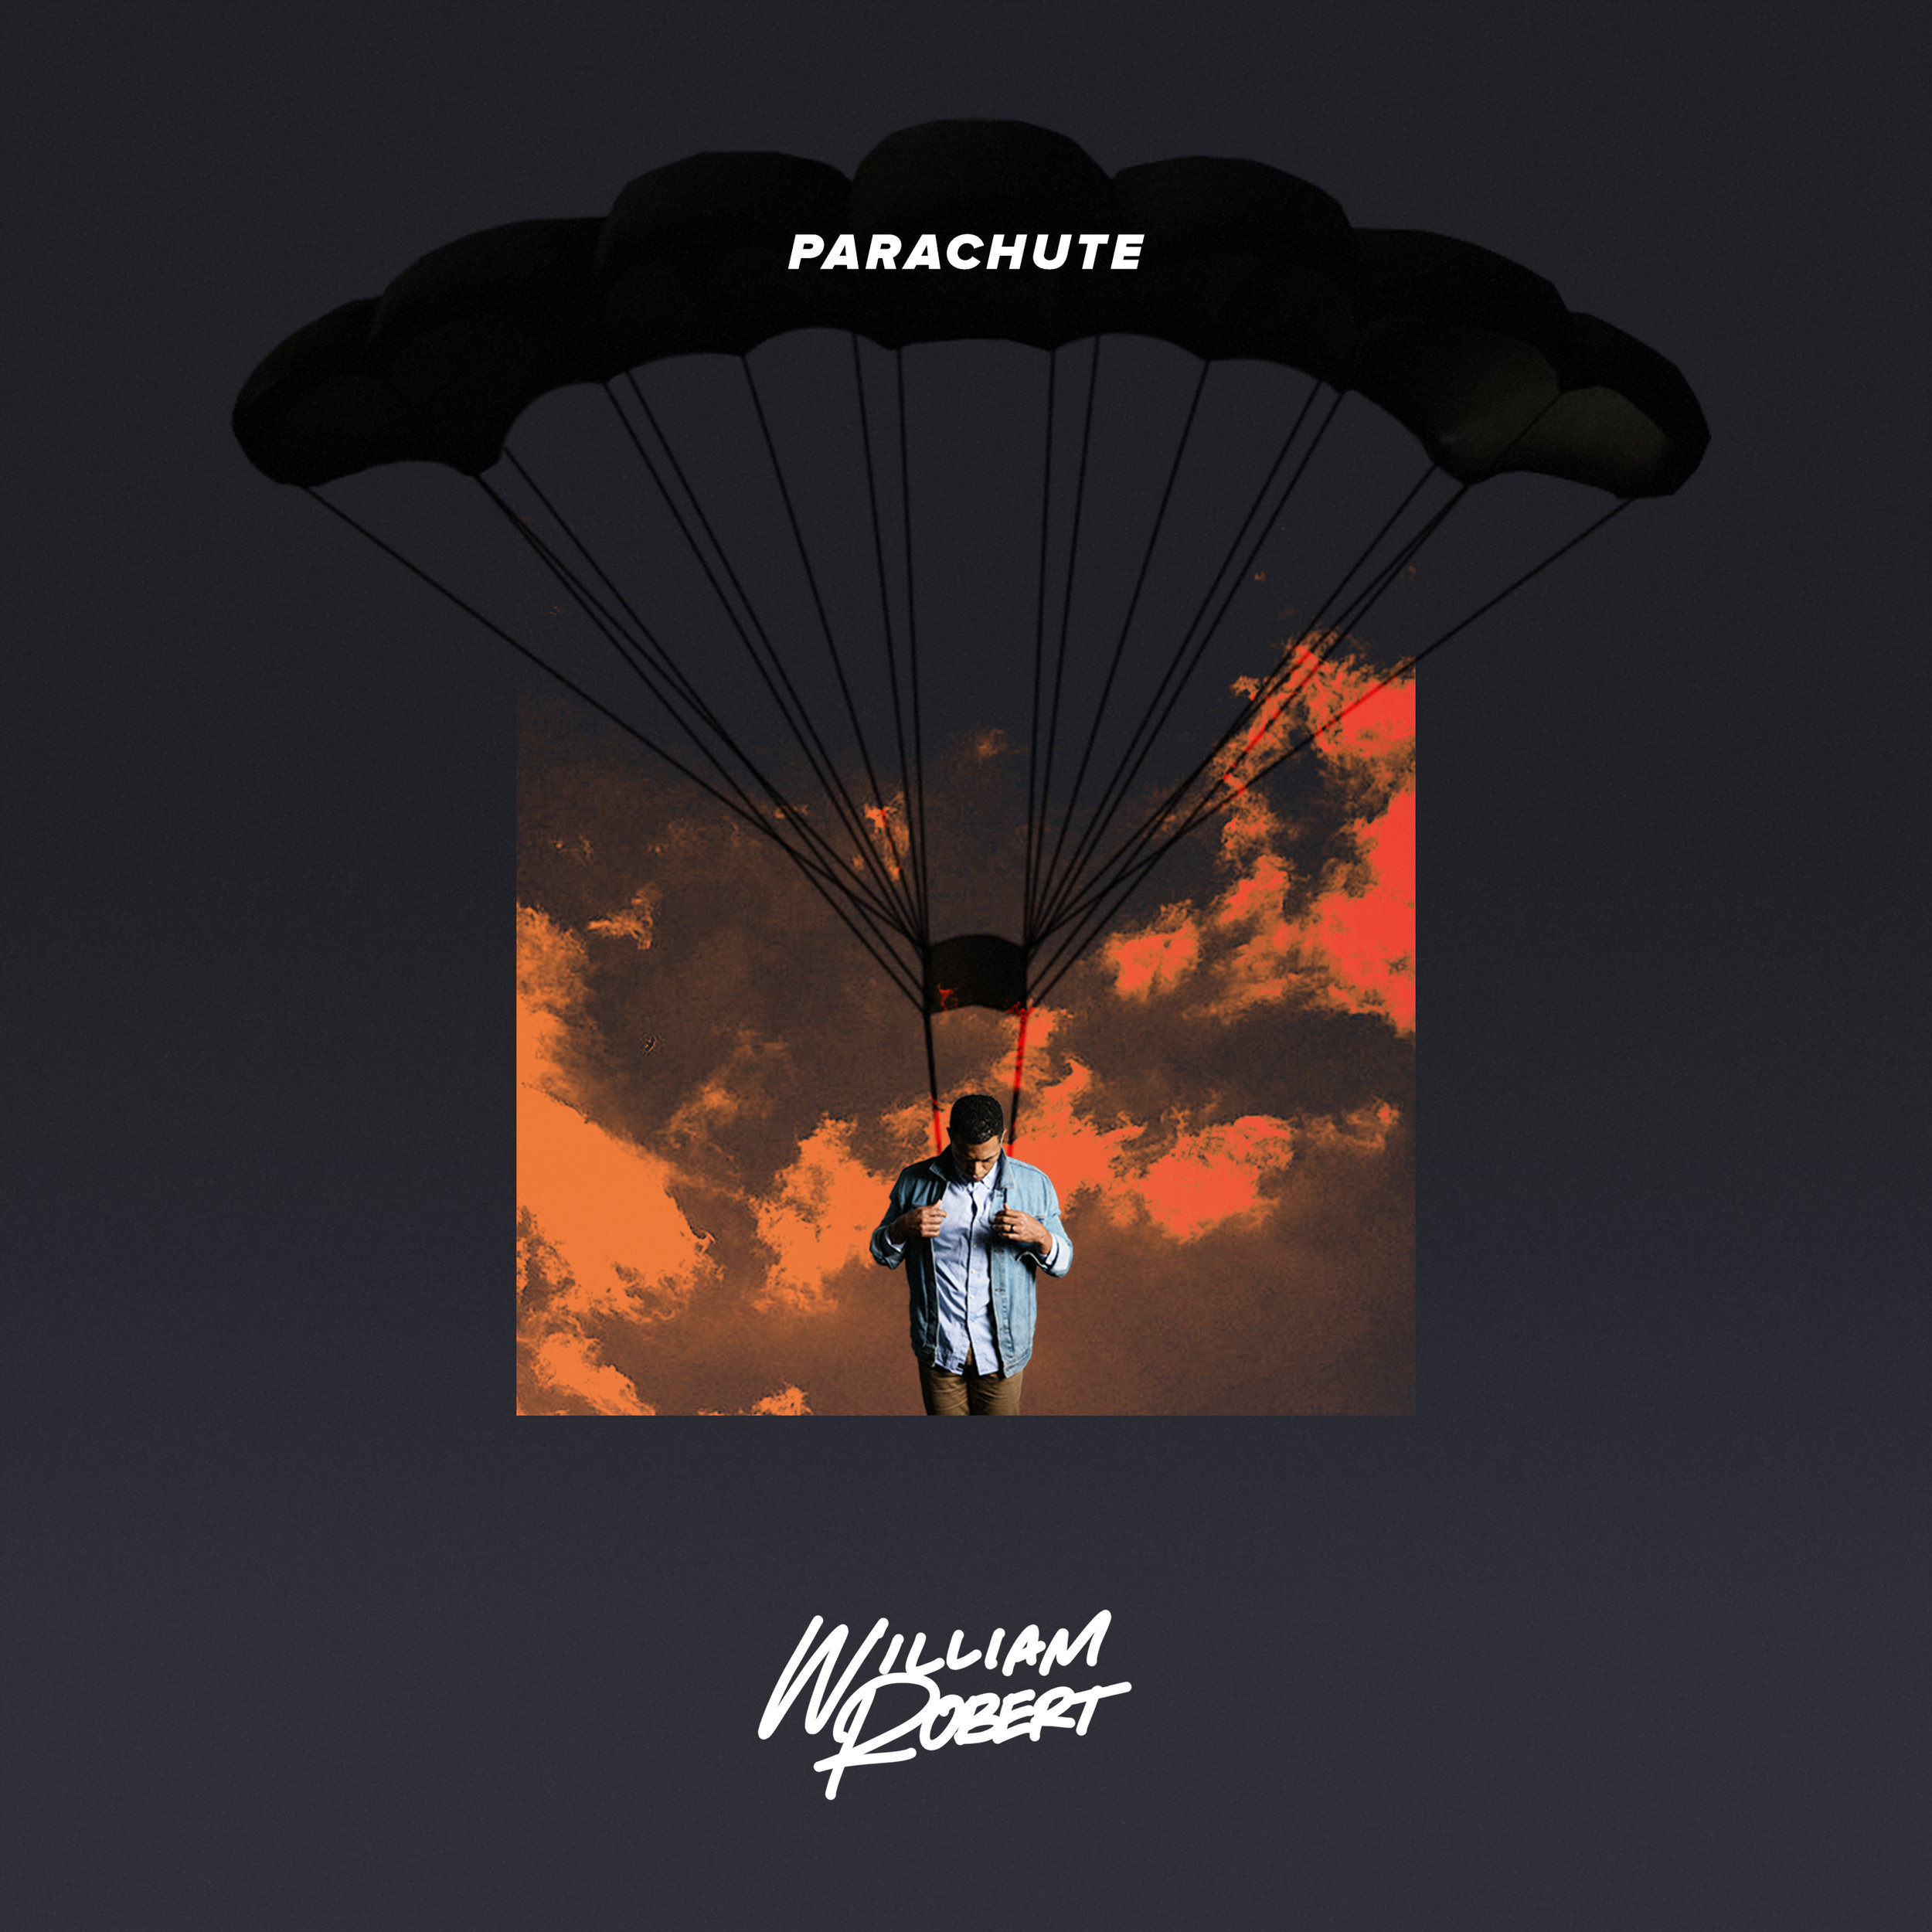 Parachute - William Robert